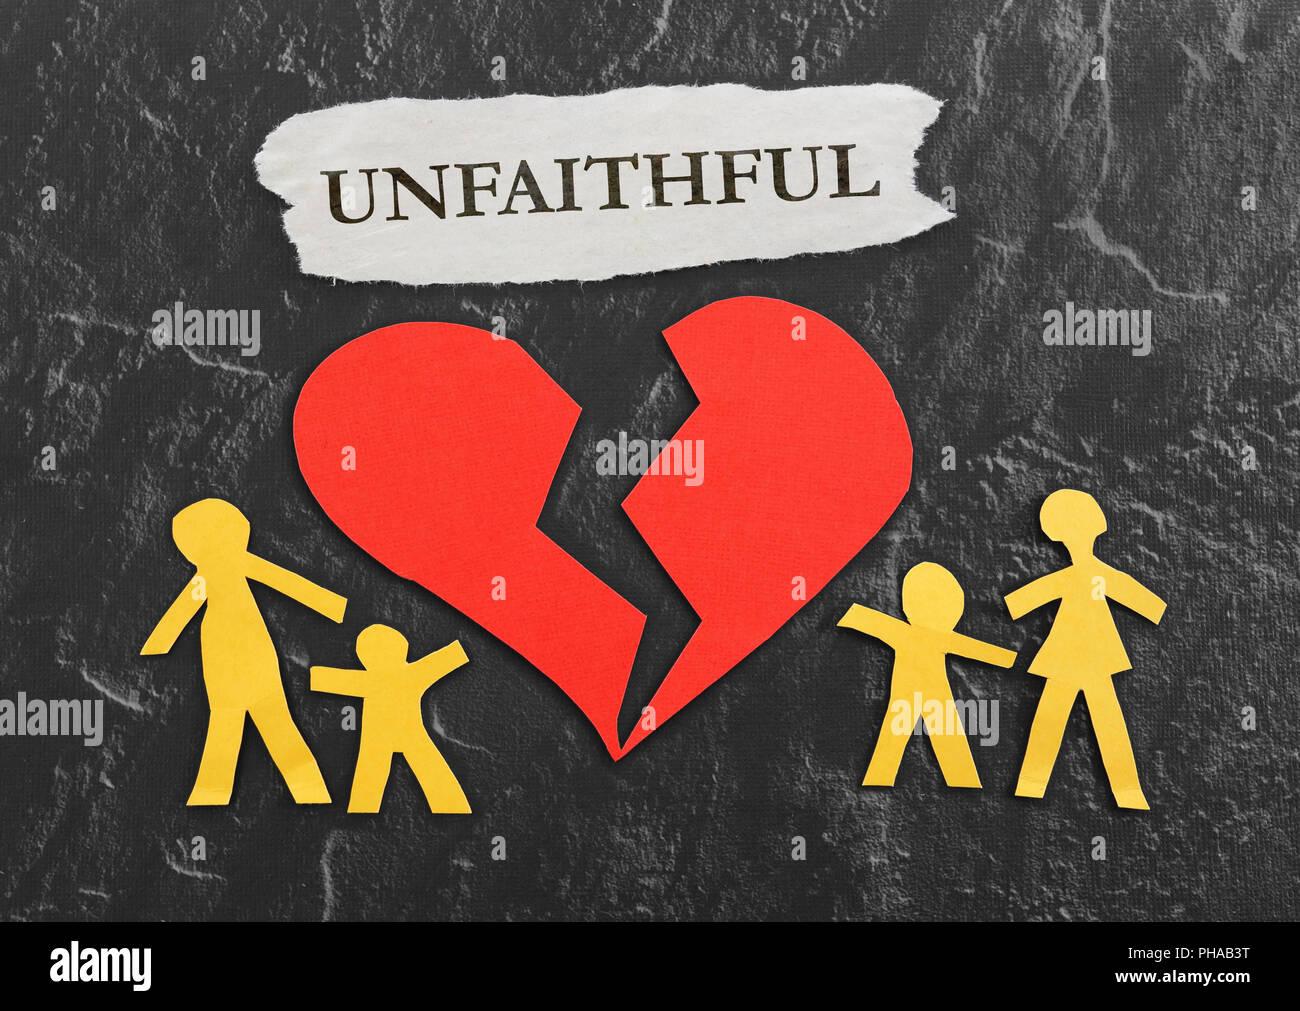 Red Unfaithful heart - Stock Image